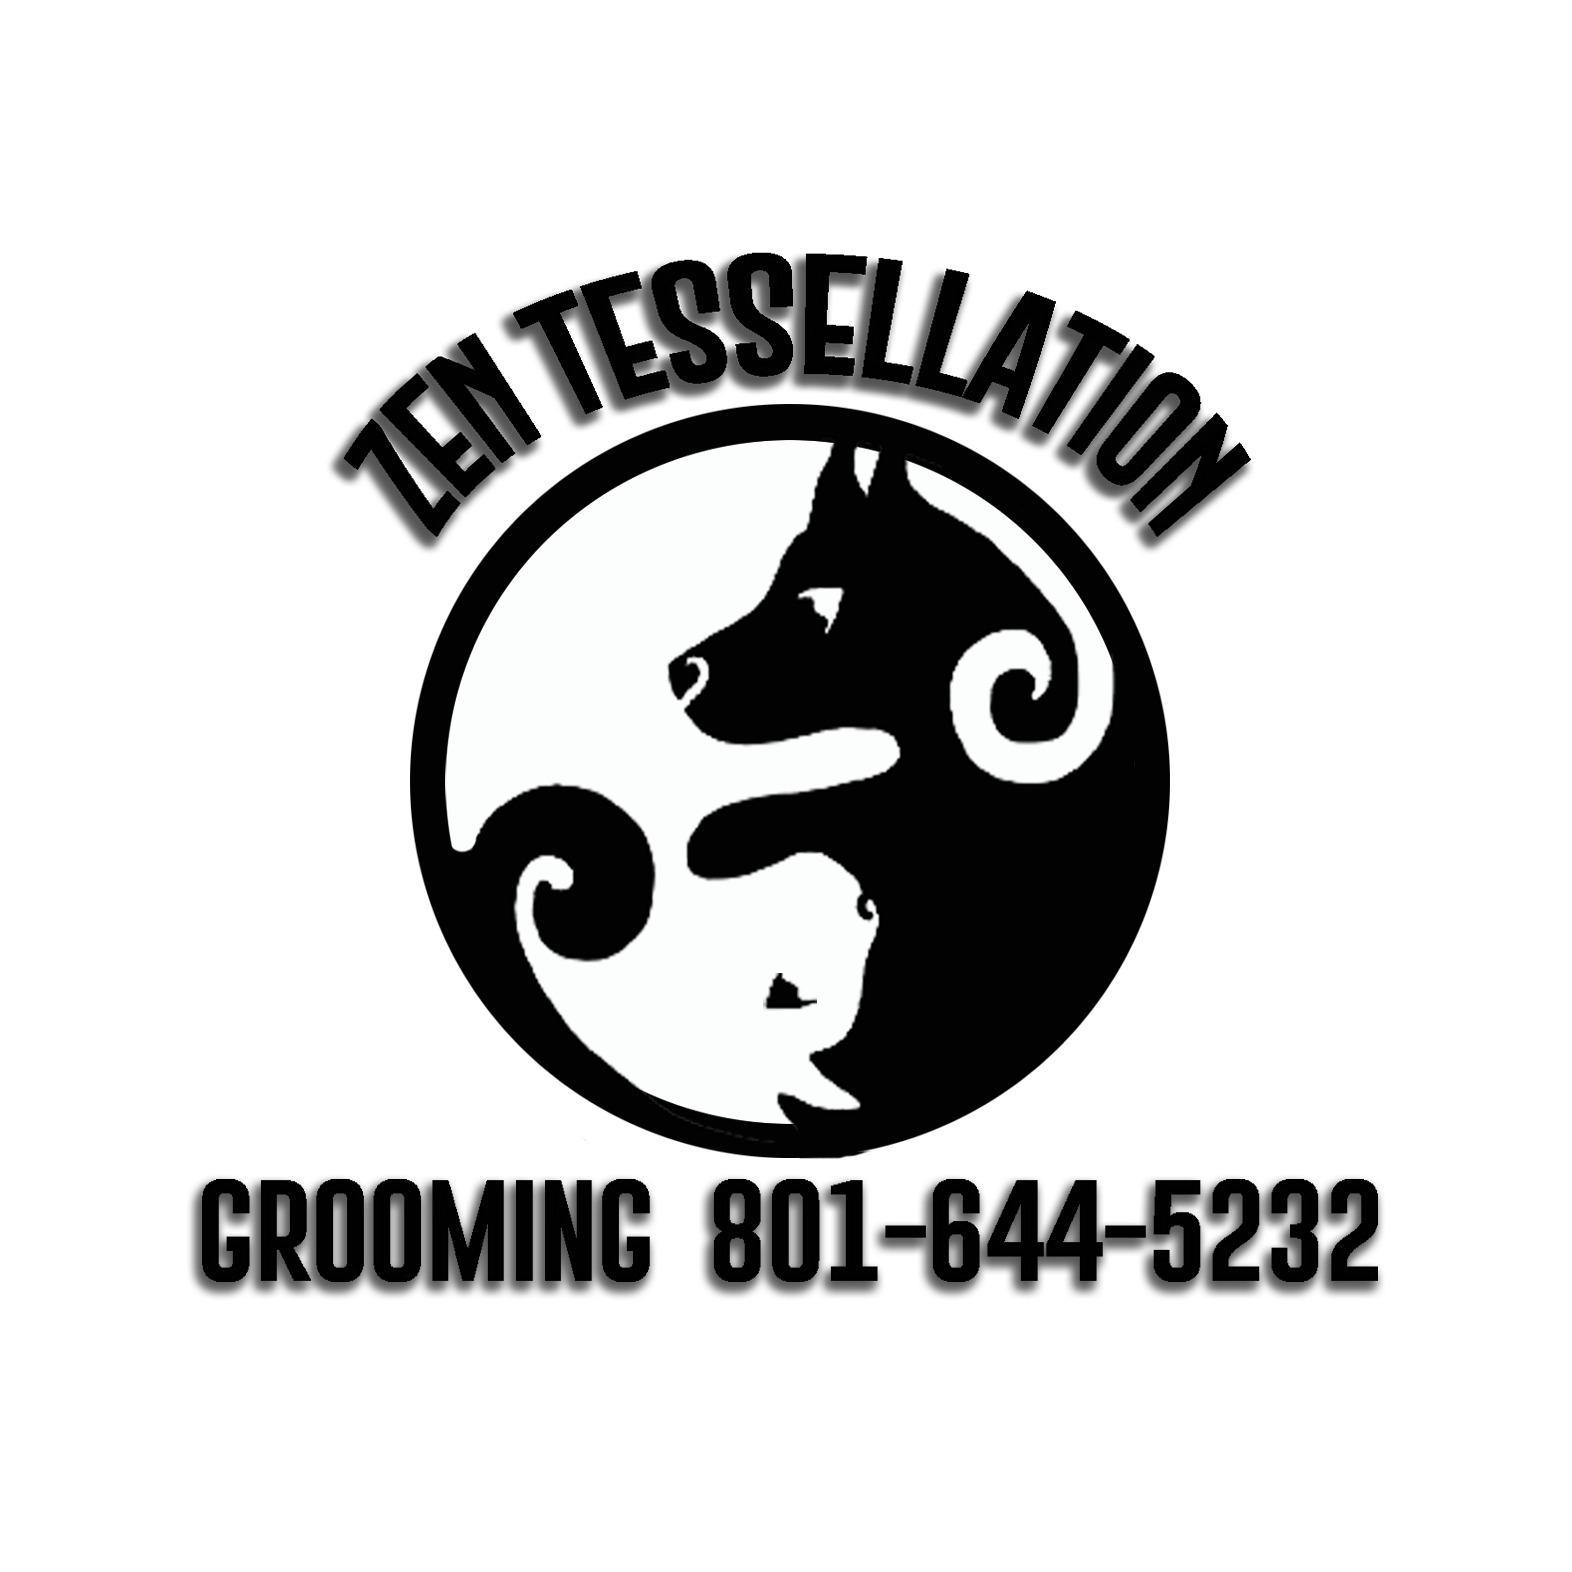 Zen Tessellation LLC